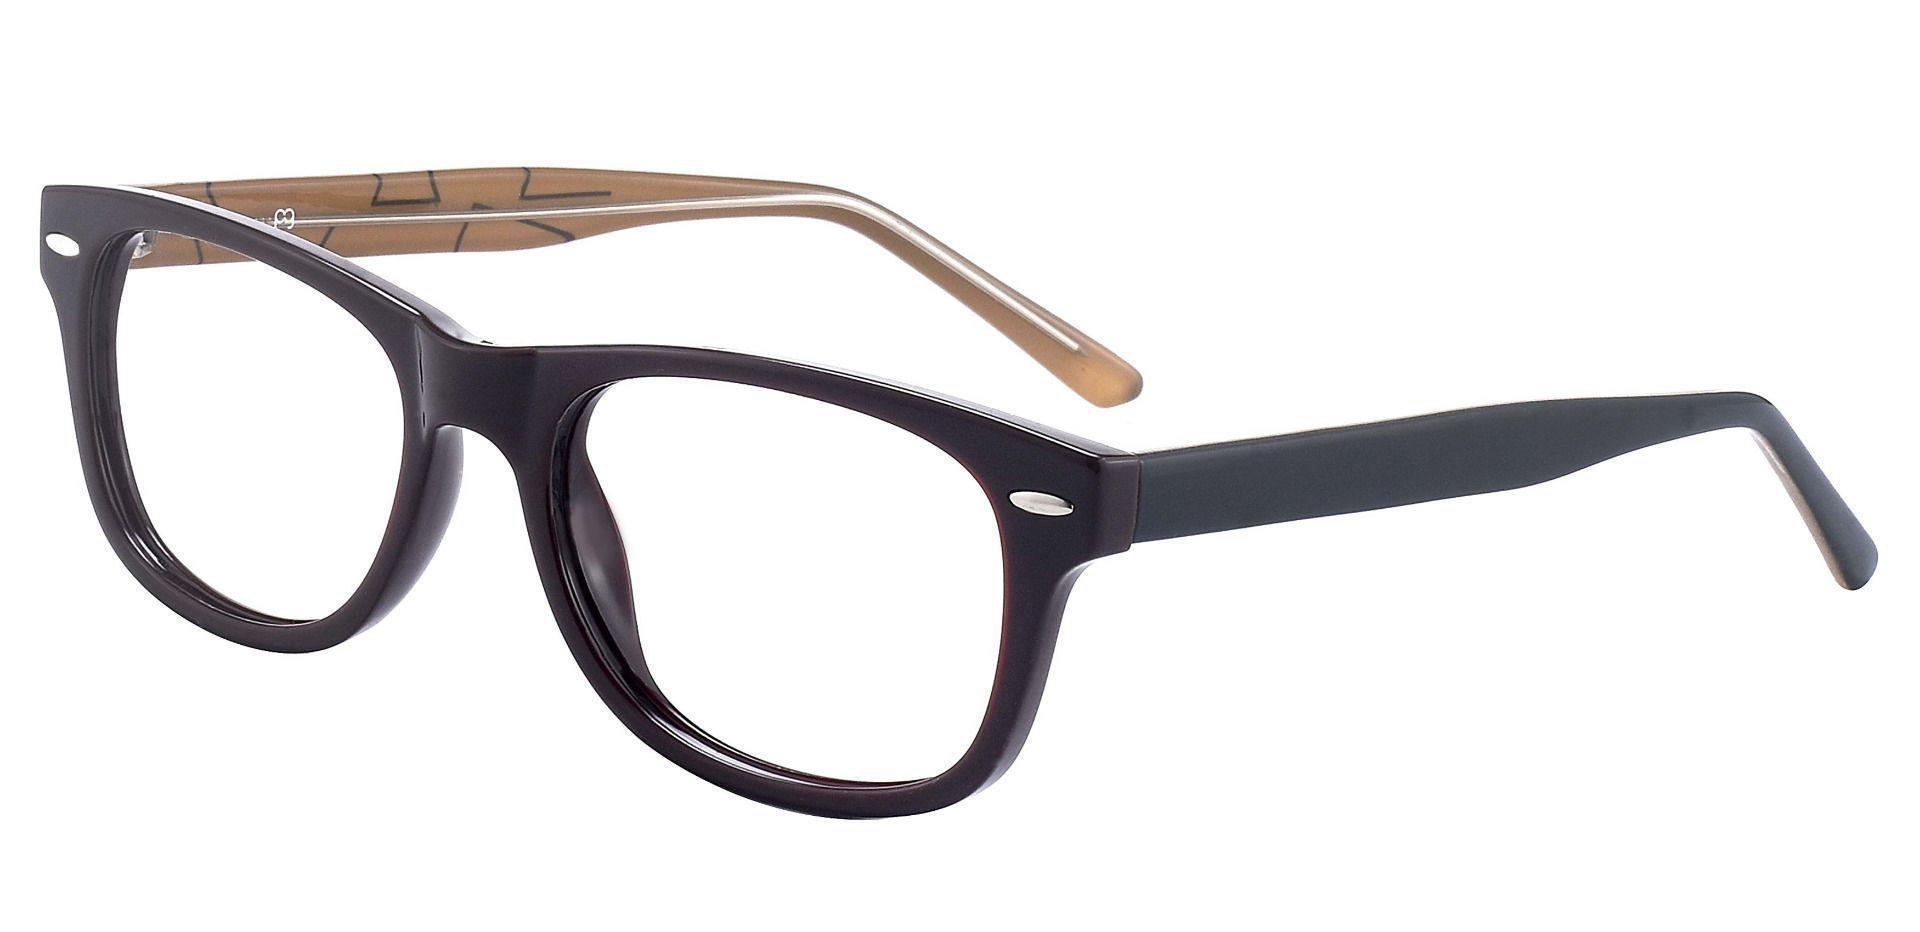 Milton Classic Square Prescription Glasses - The Frame Is Black And Brown